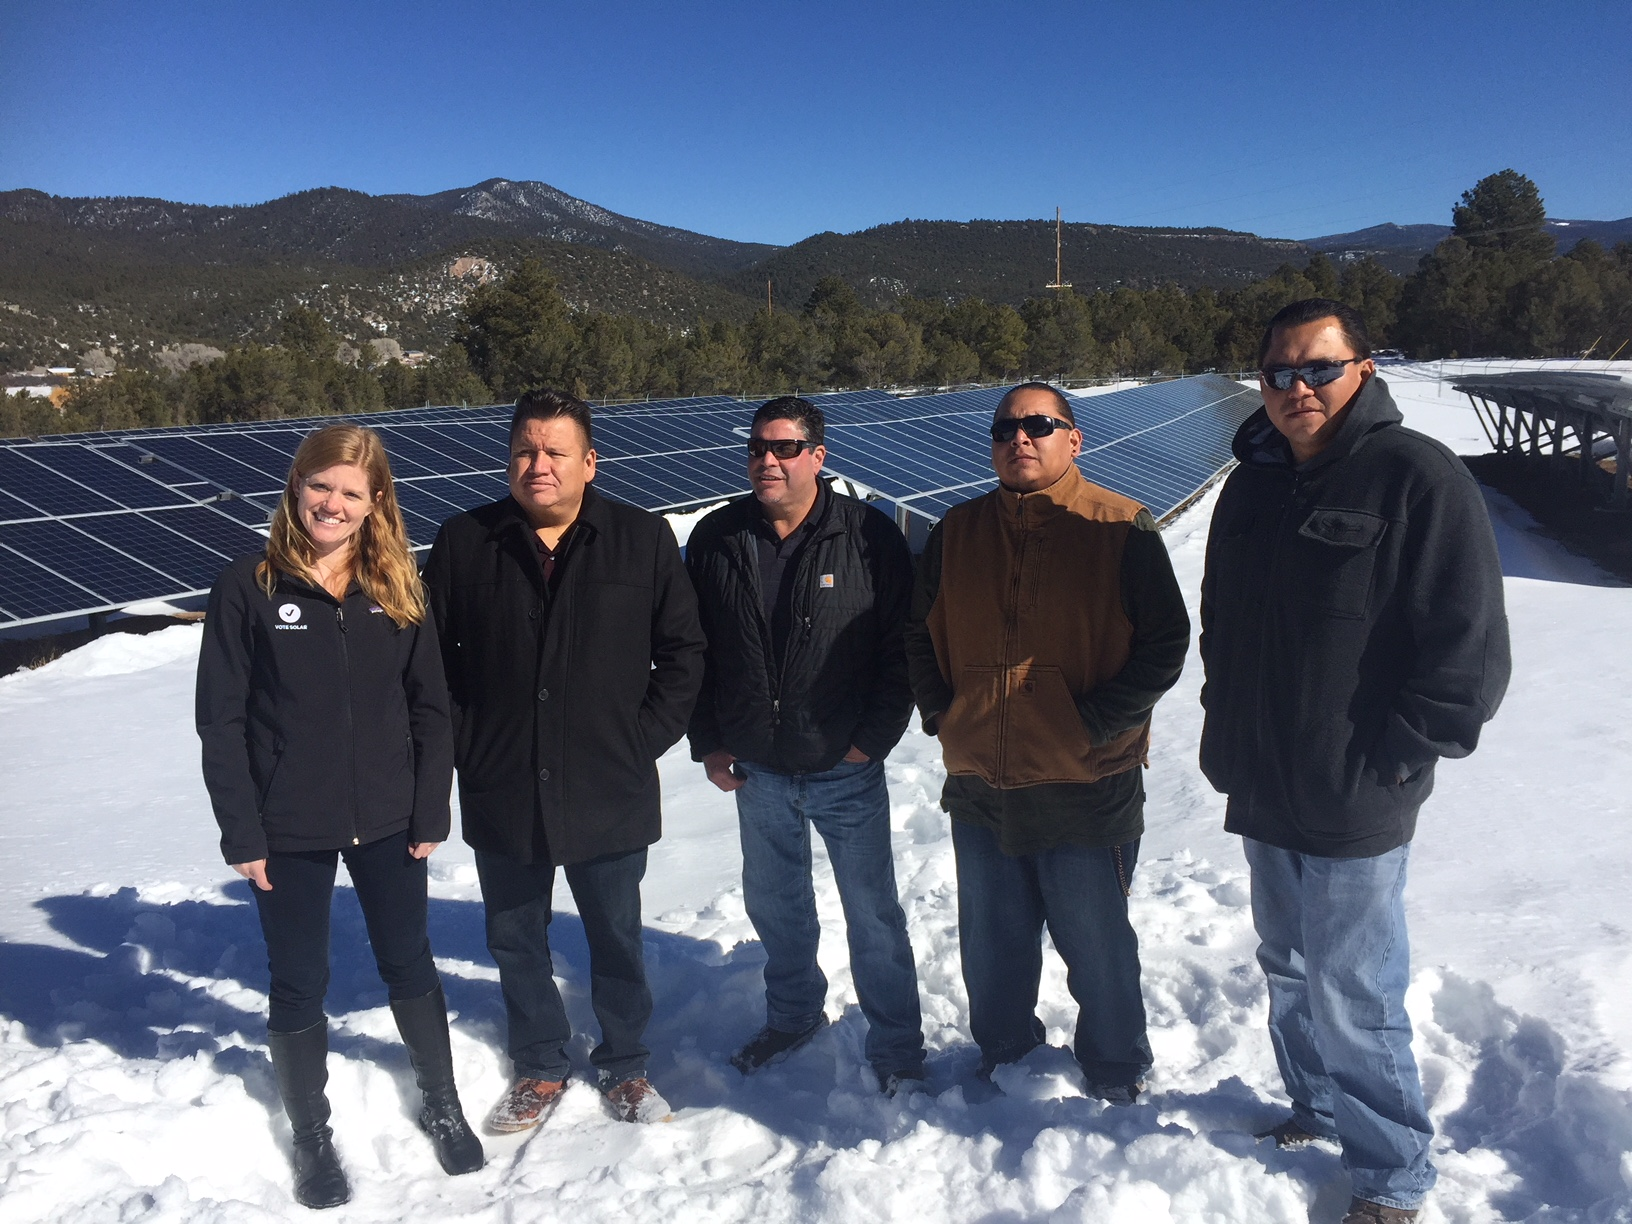 Picuris Pueblo: Shining Light on New Mexico's Community Solar Opportunity